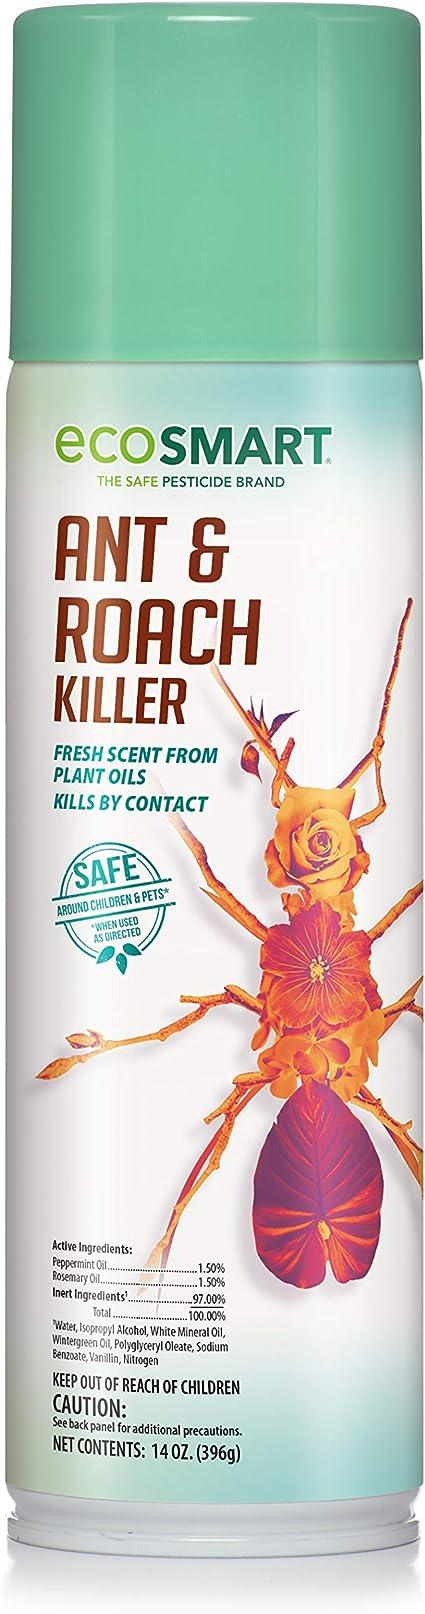 Amazon Com Ecosmart Ant And Roach Killer 14 Oz Aerosol Spray Can Insect Repellents Garden Outdoor